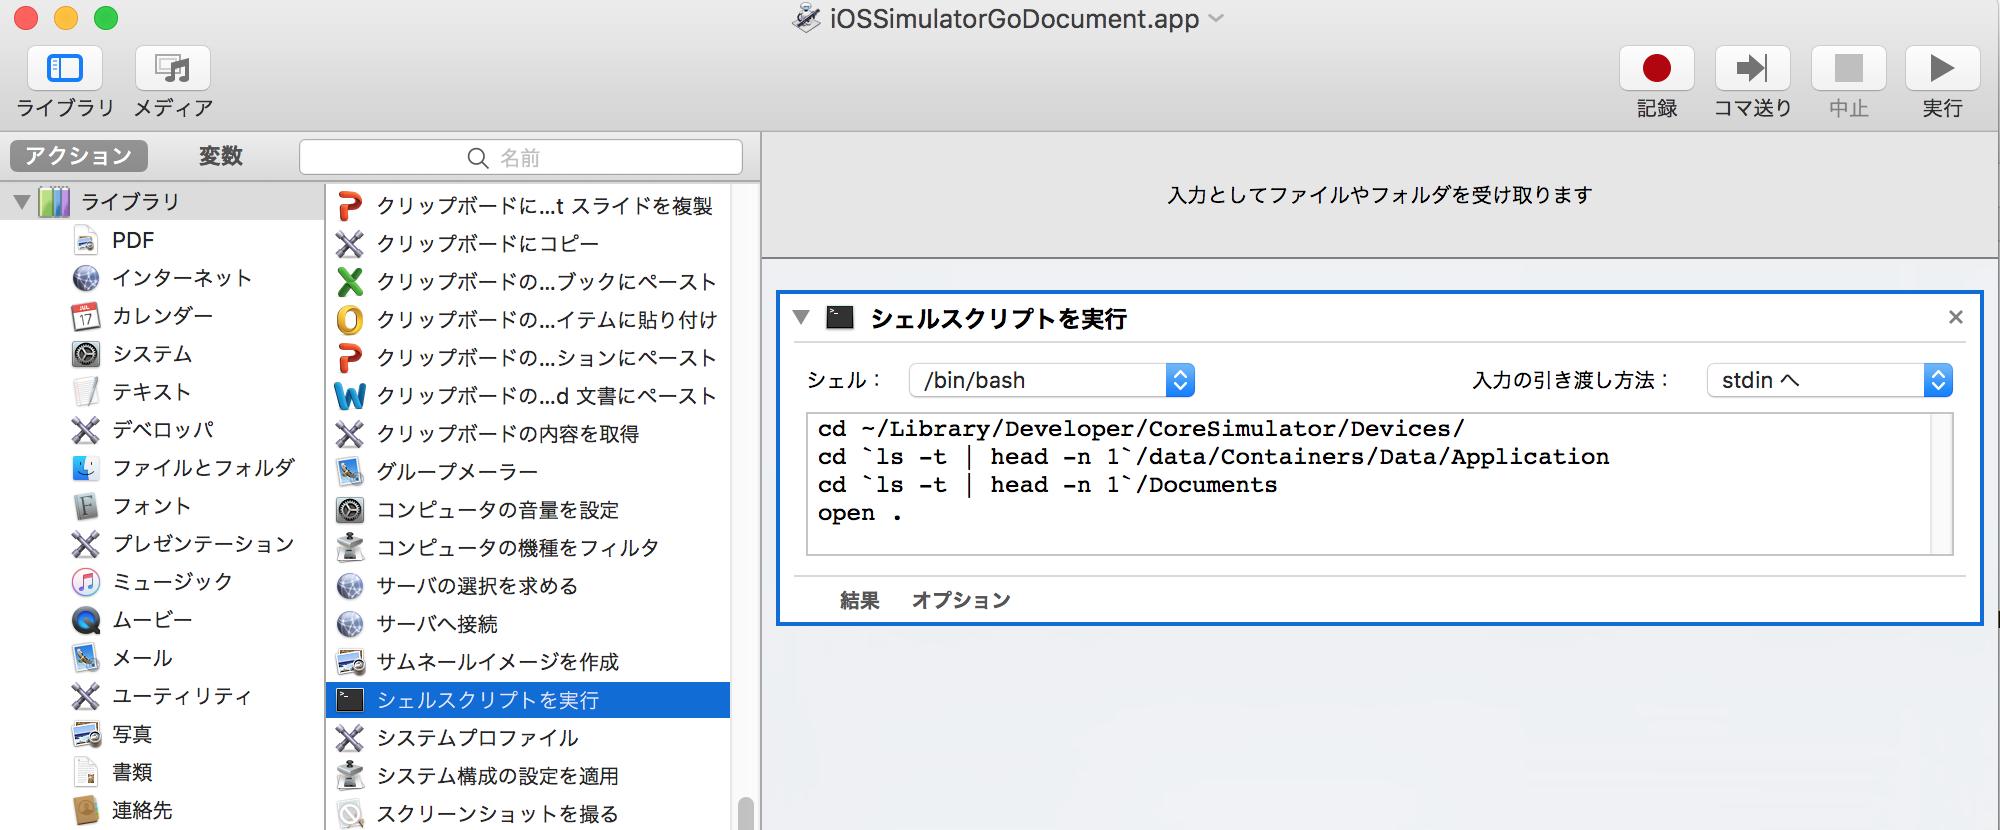 xcode:iOS シミュレーターのフォルダの場所 - Qiita